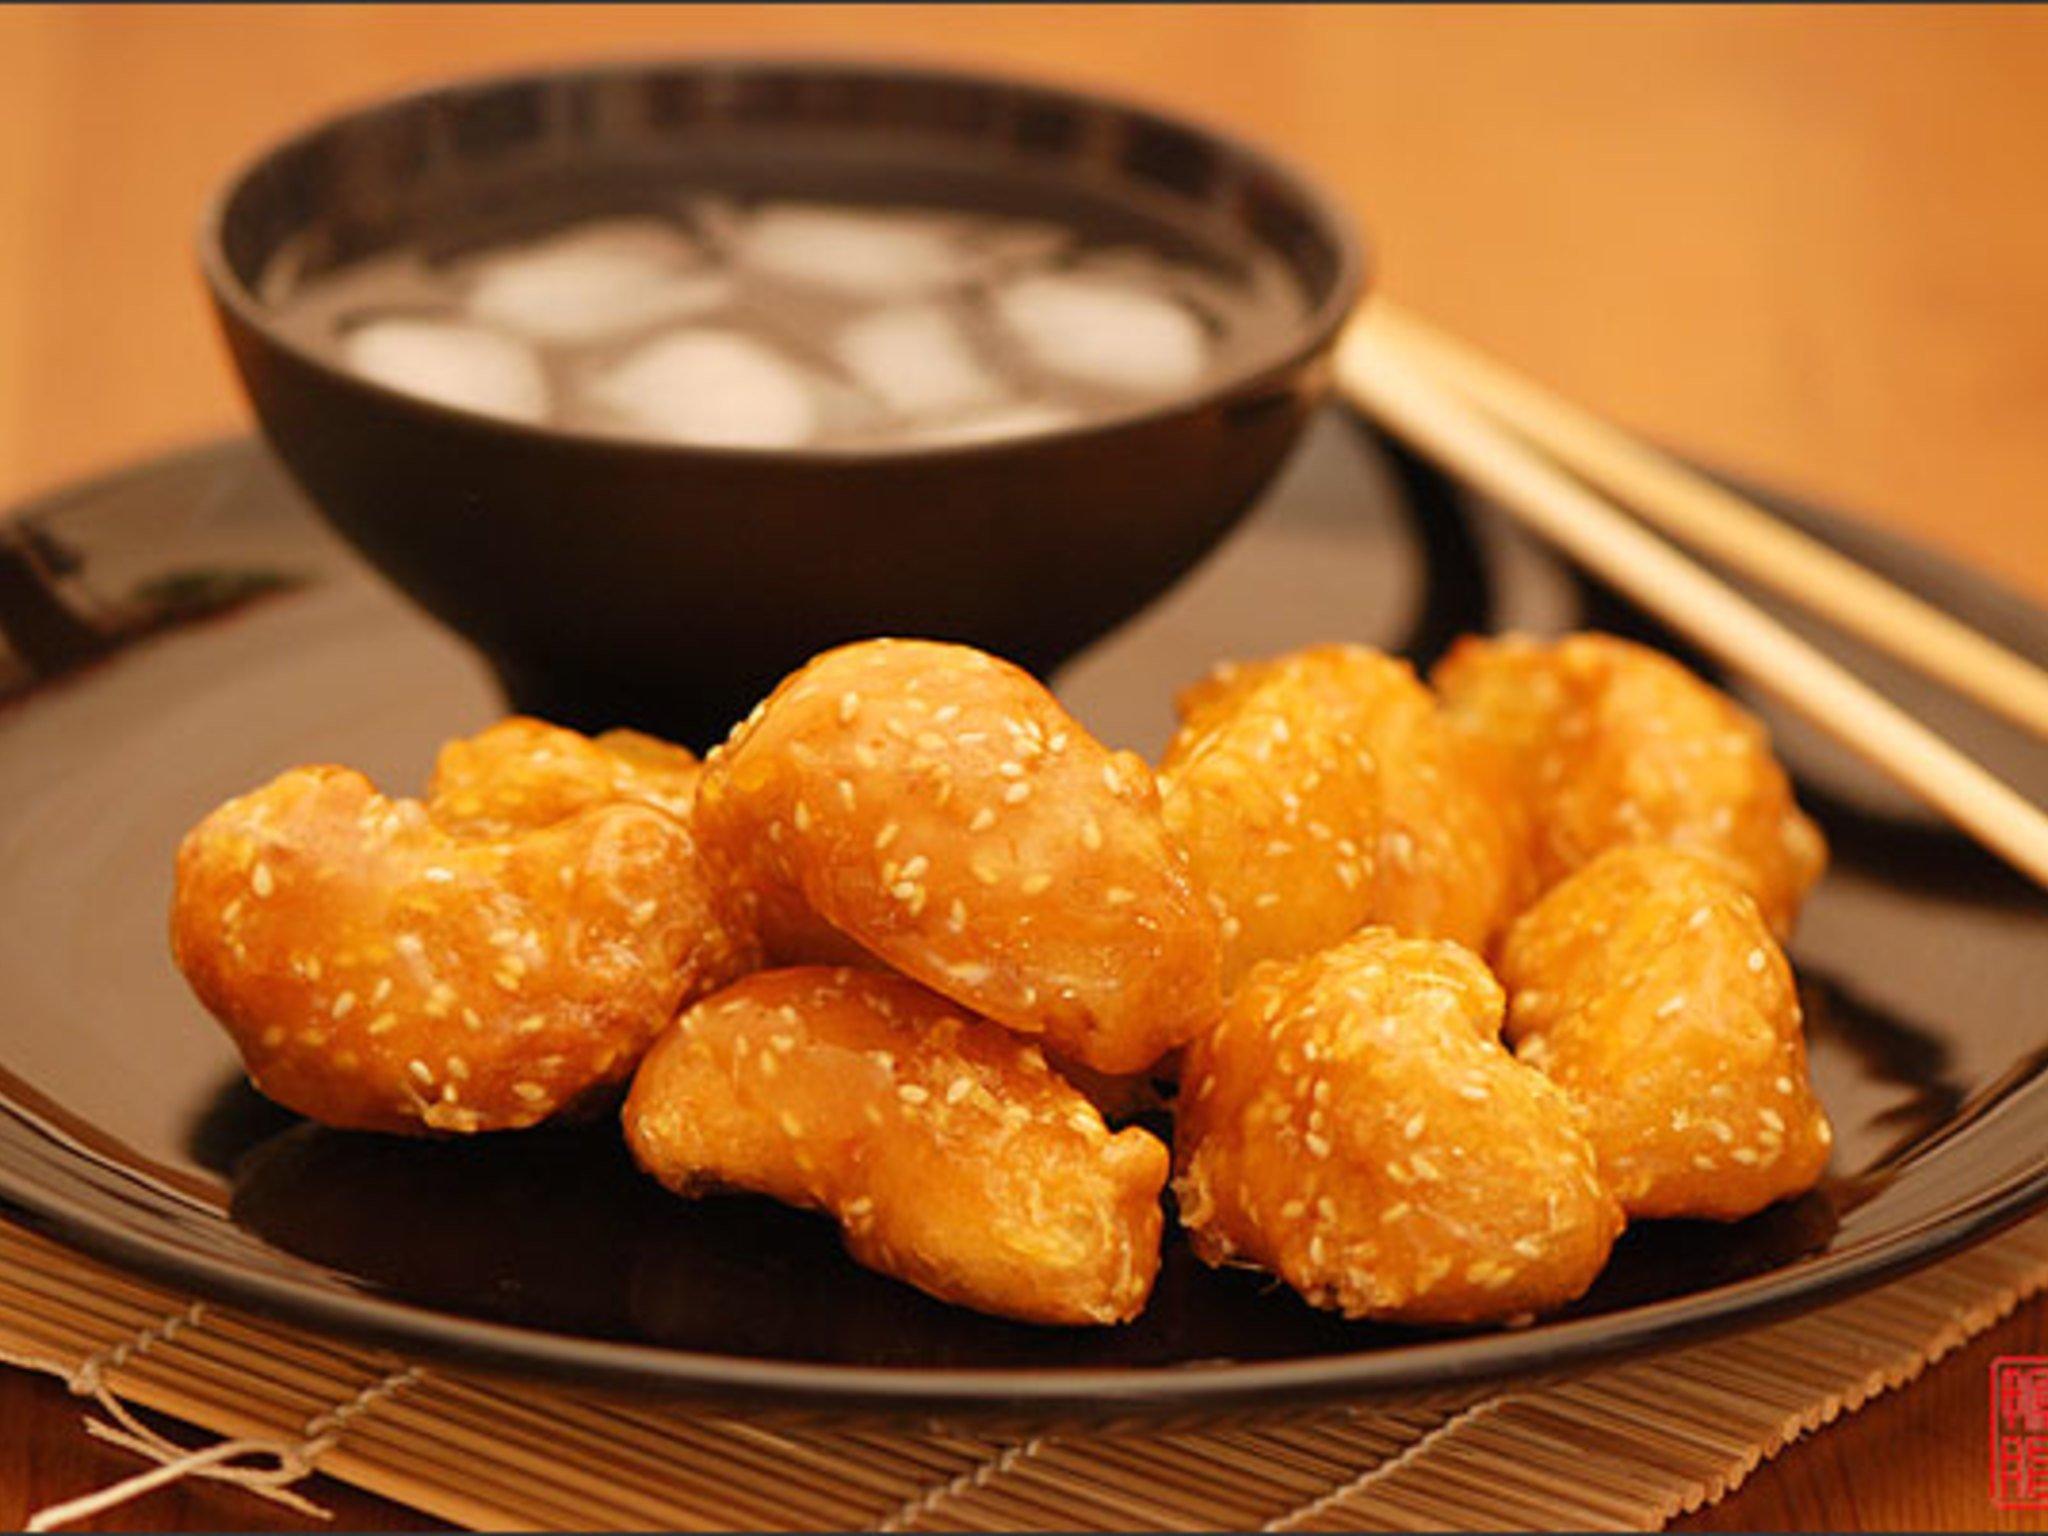 Фрукты в карамели по-китайски рецепт с фото пошагово